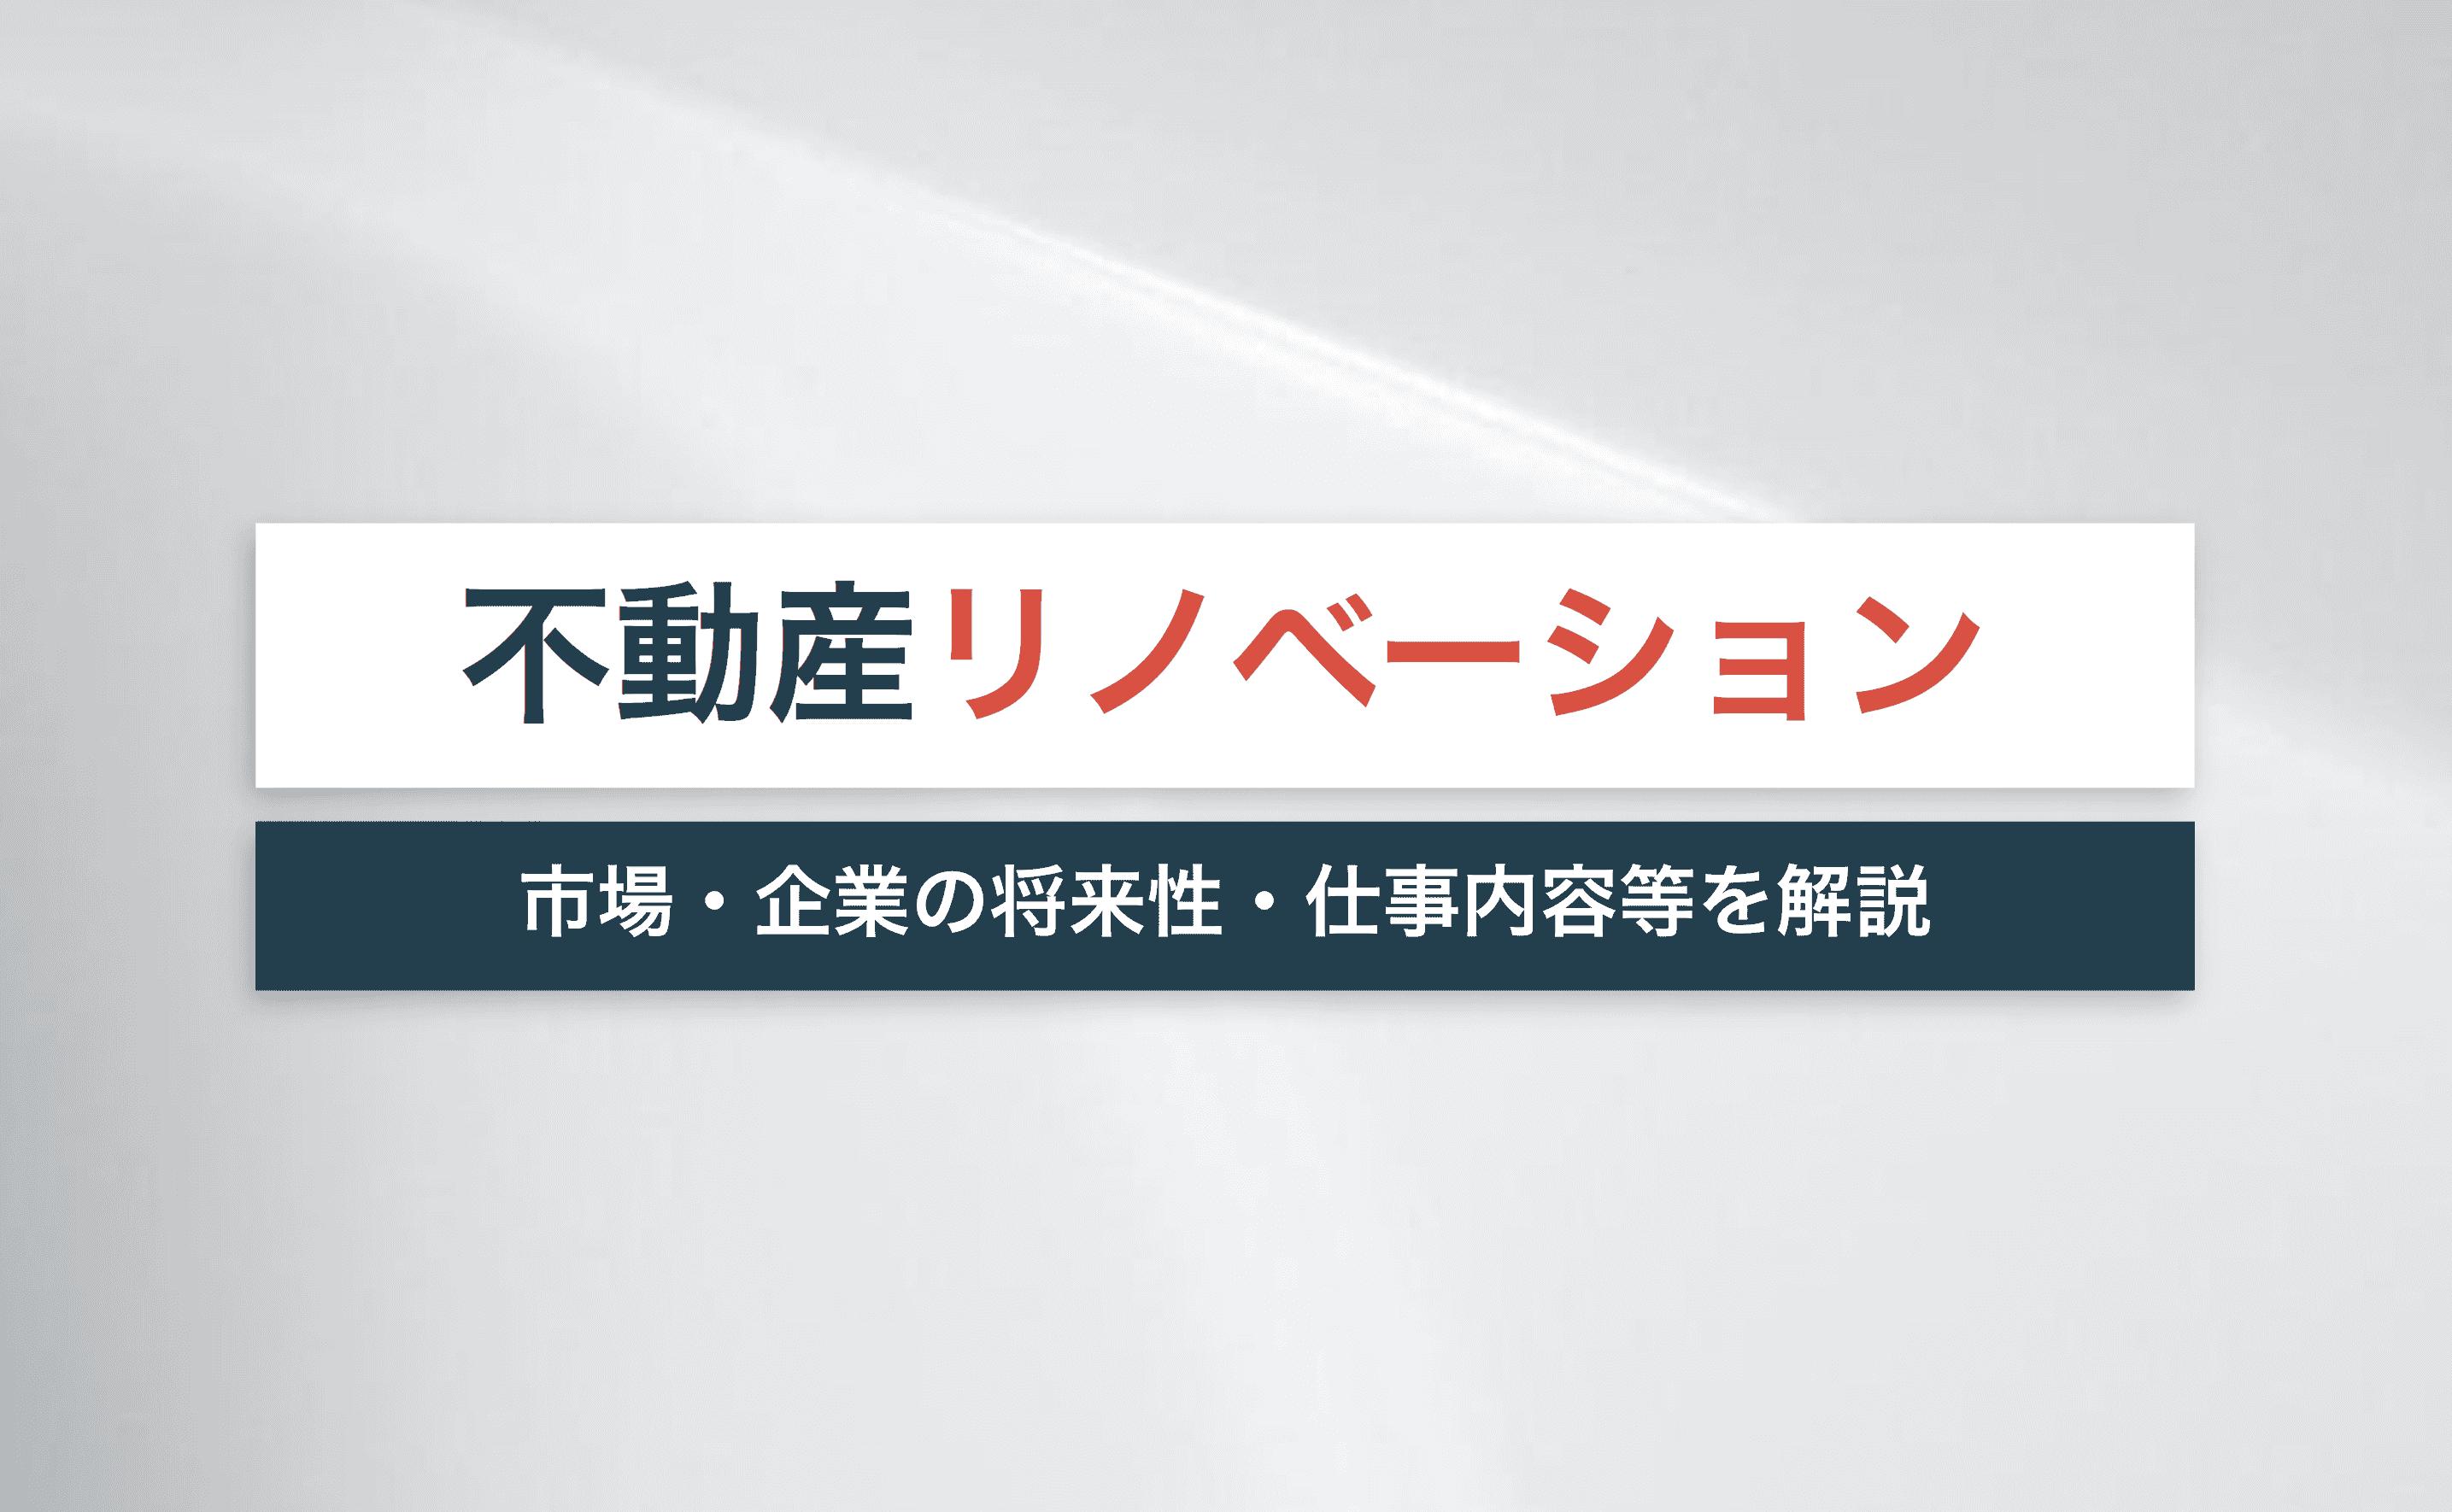 https://block.fm/news/future_thewizrd_edc